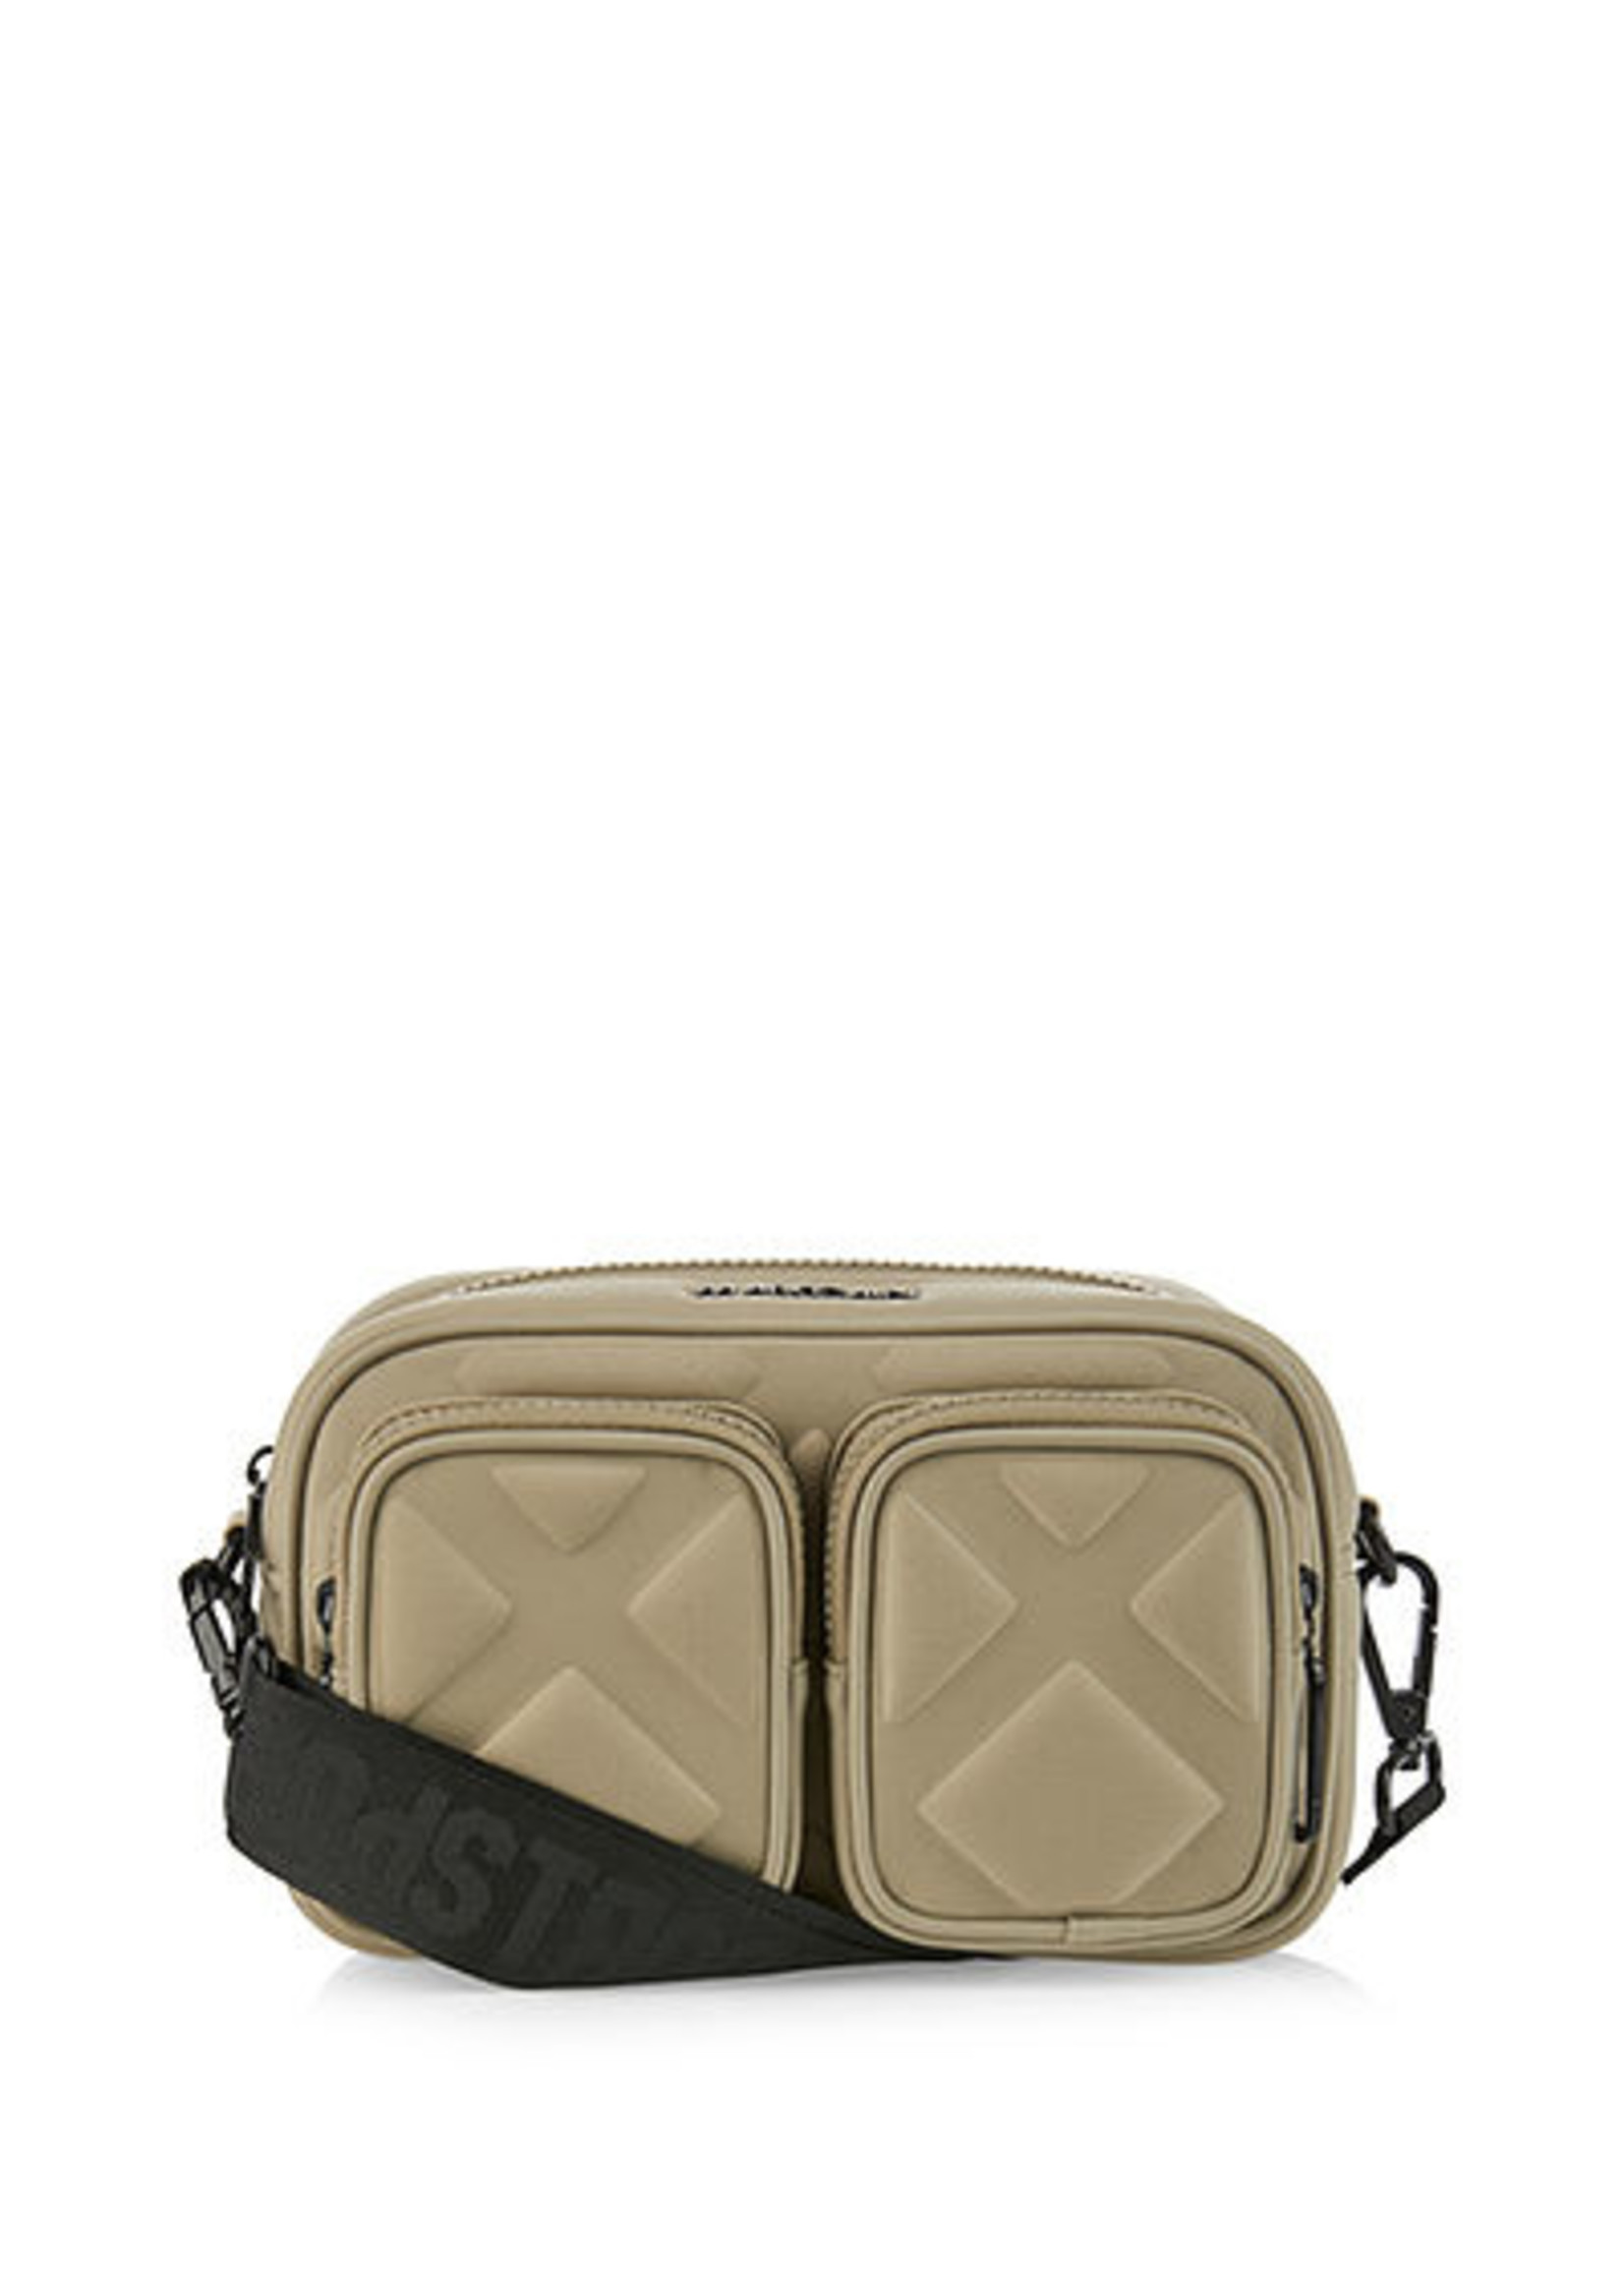 Marccain Bags & Shoes Shopper RB TI.11 J05 latte macchiato